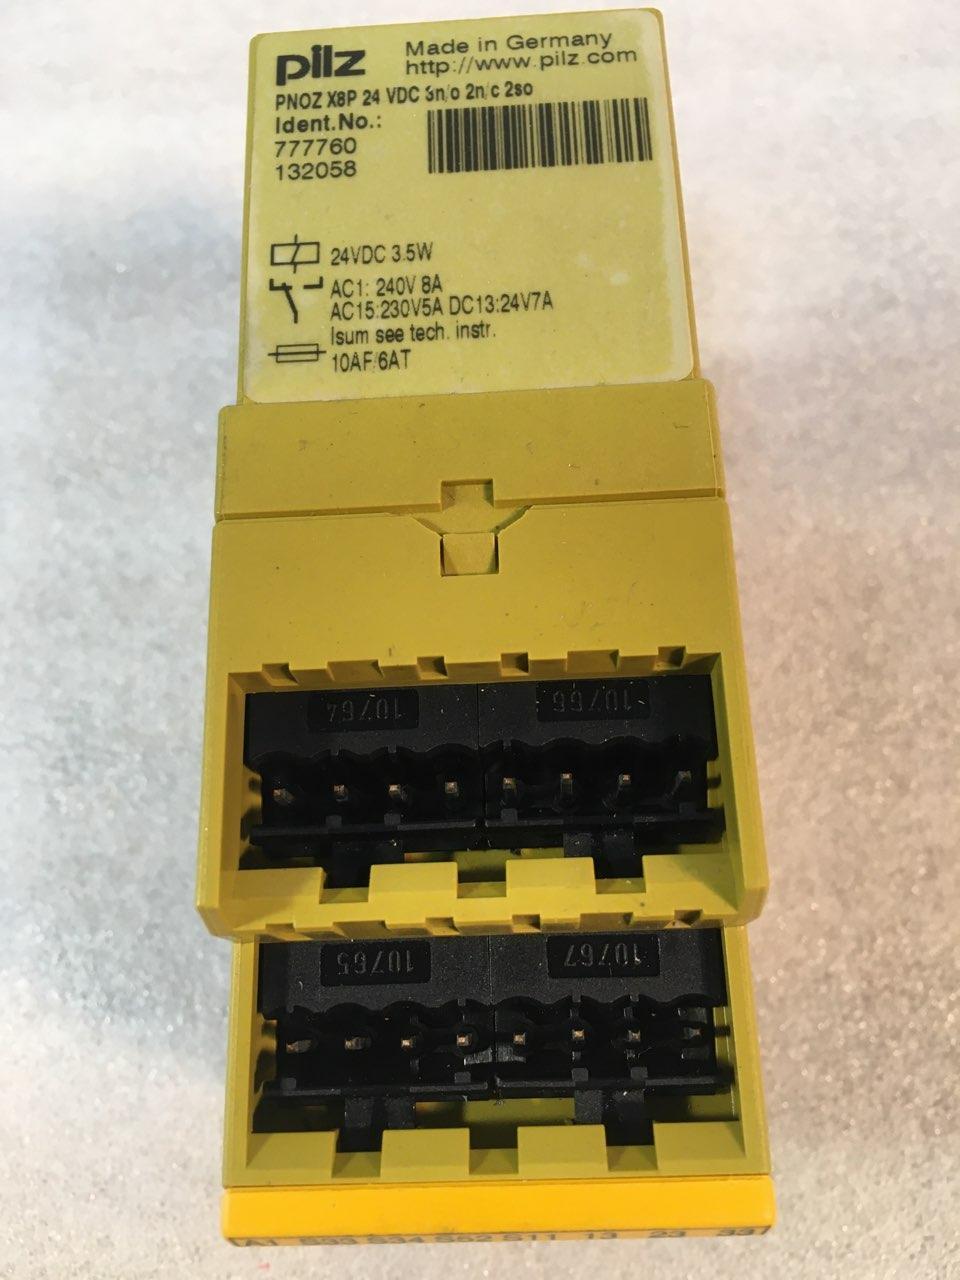 PILZ PNOZ X8P SAFETY RELAY, 777760, 24 VDC,  3n/o 2n/c 2so,  3.5W